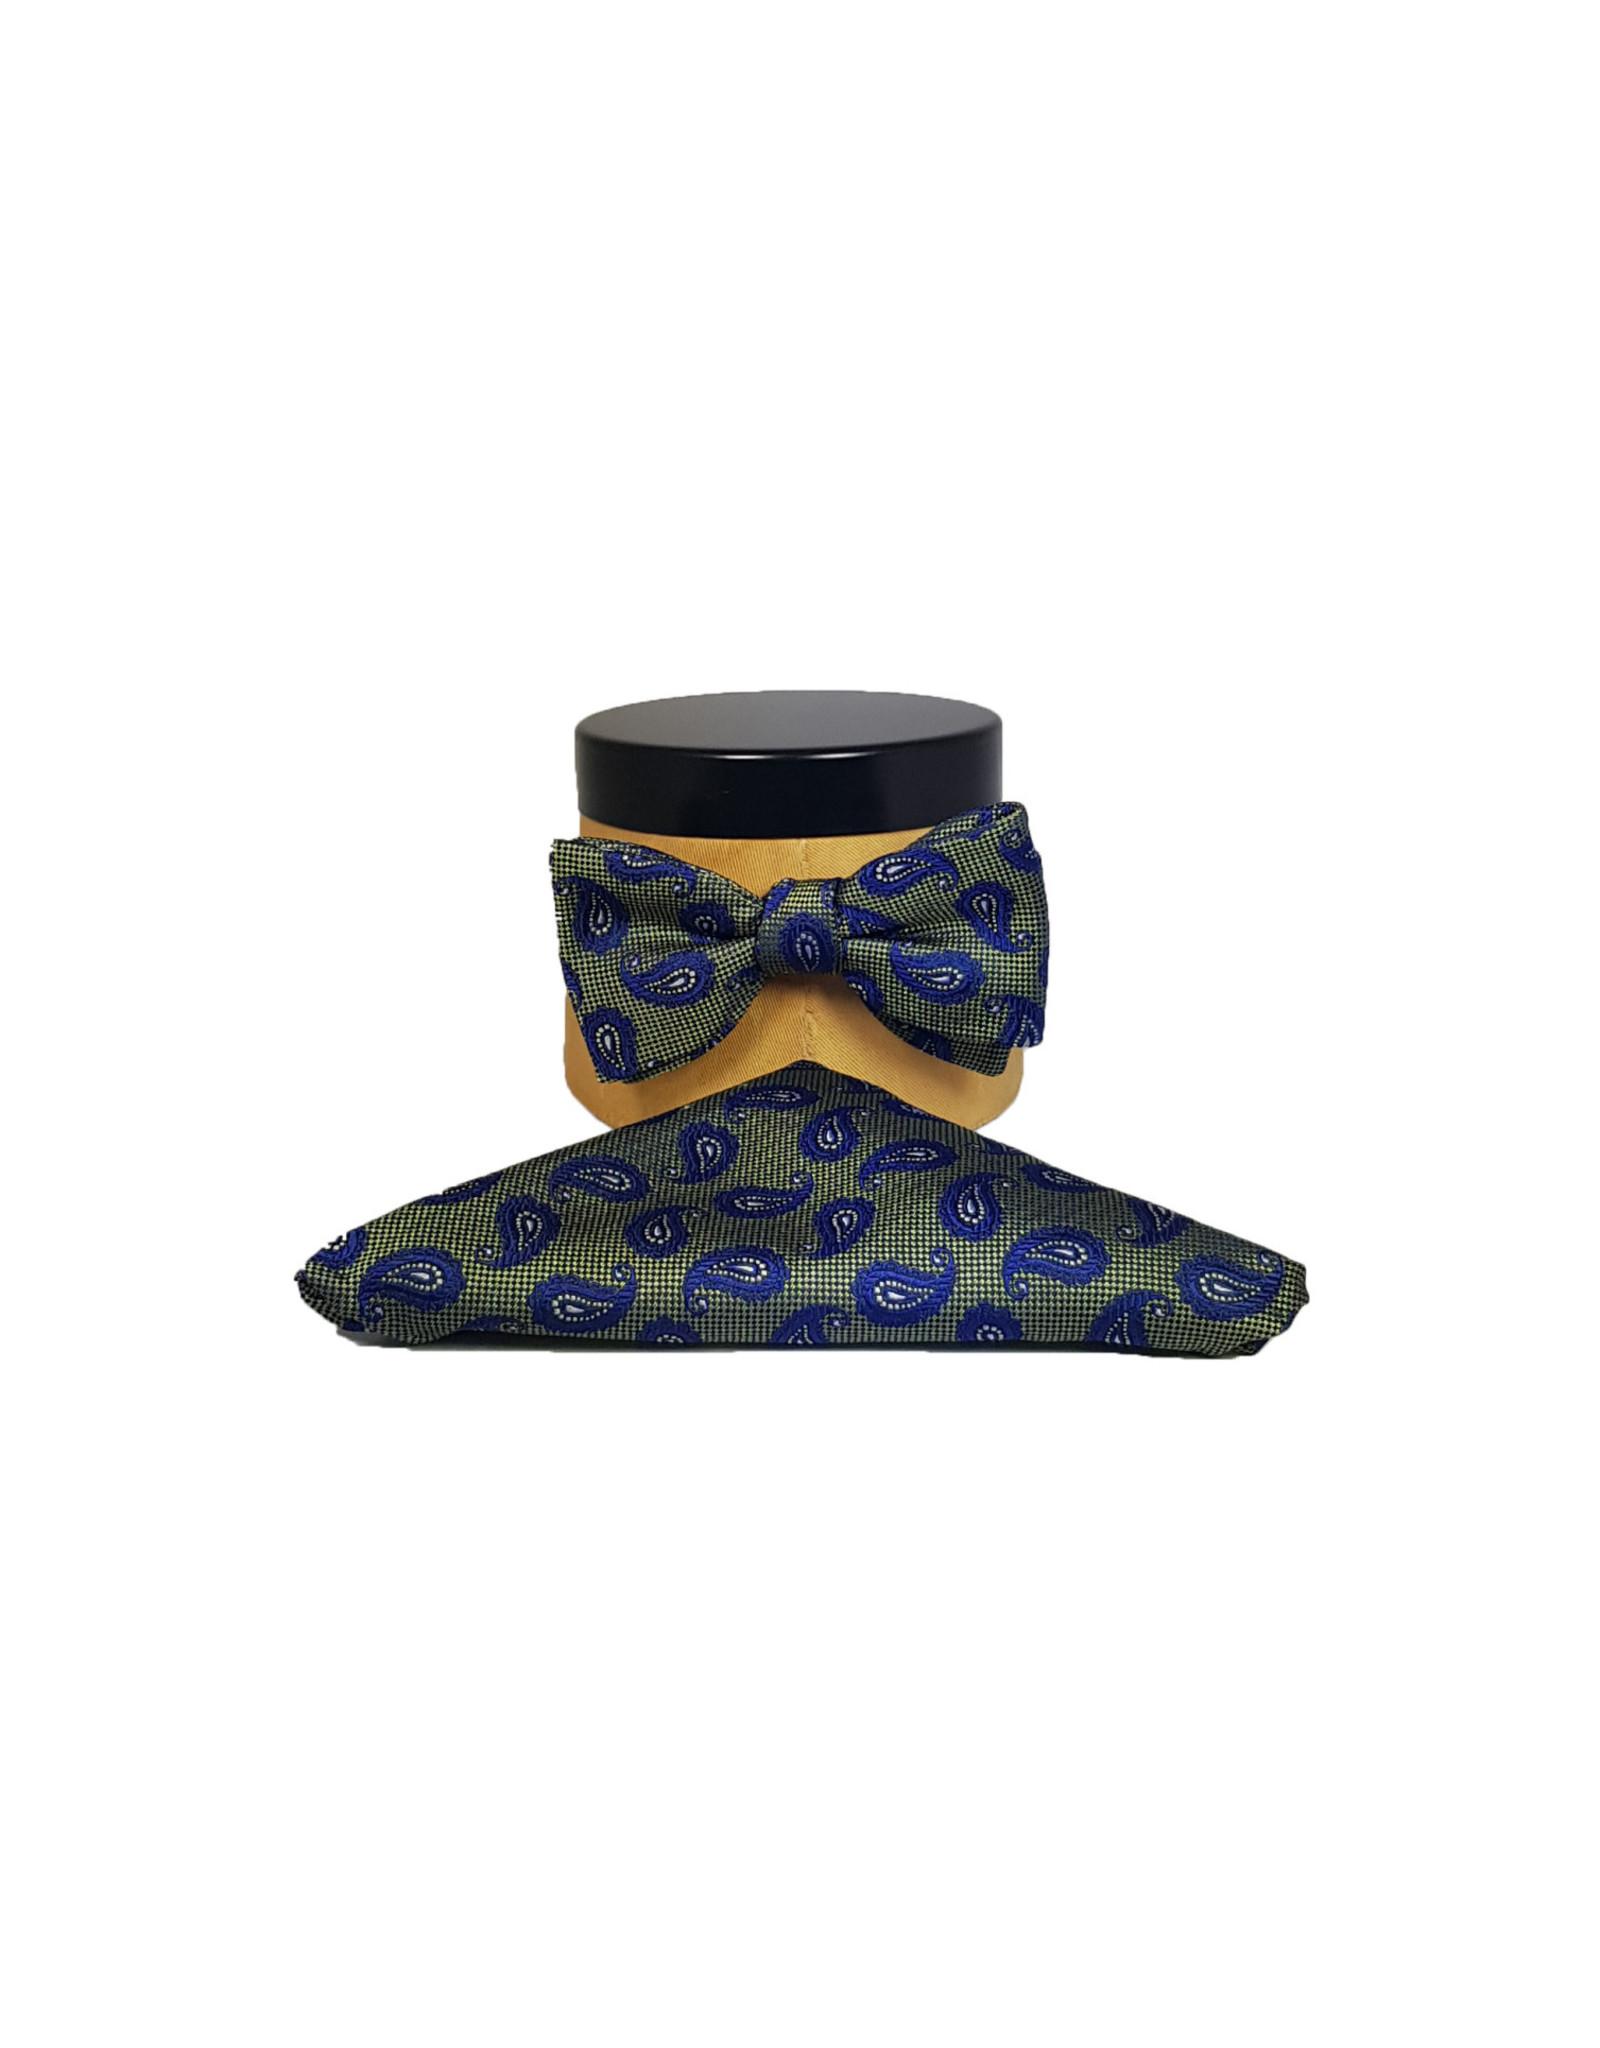 Ascot Sandmore's strik groen-blauw paisley 723/3